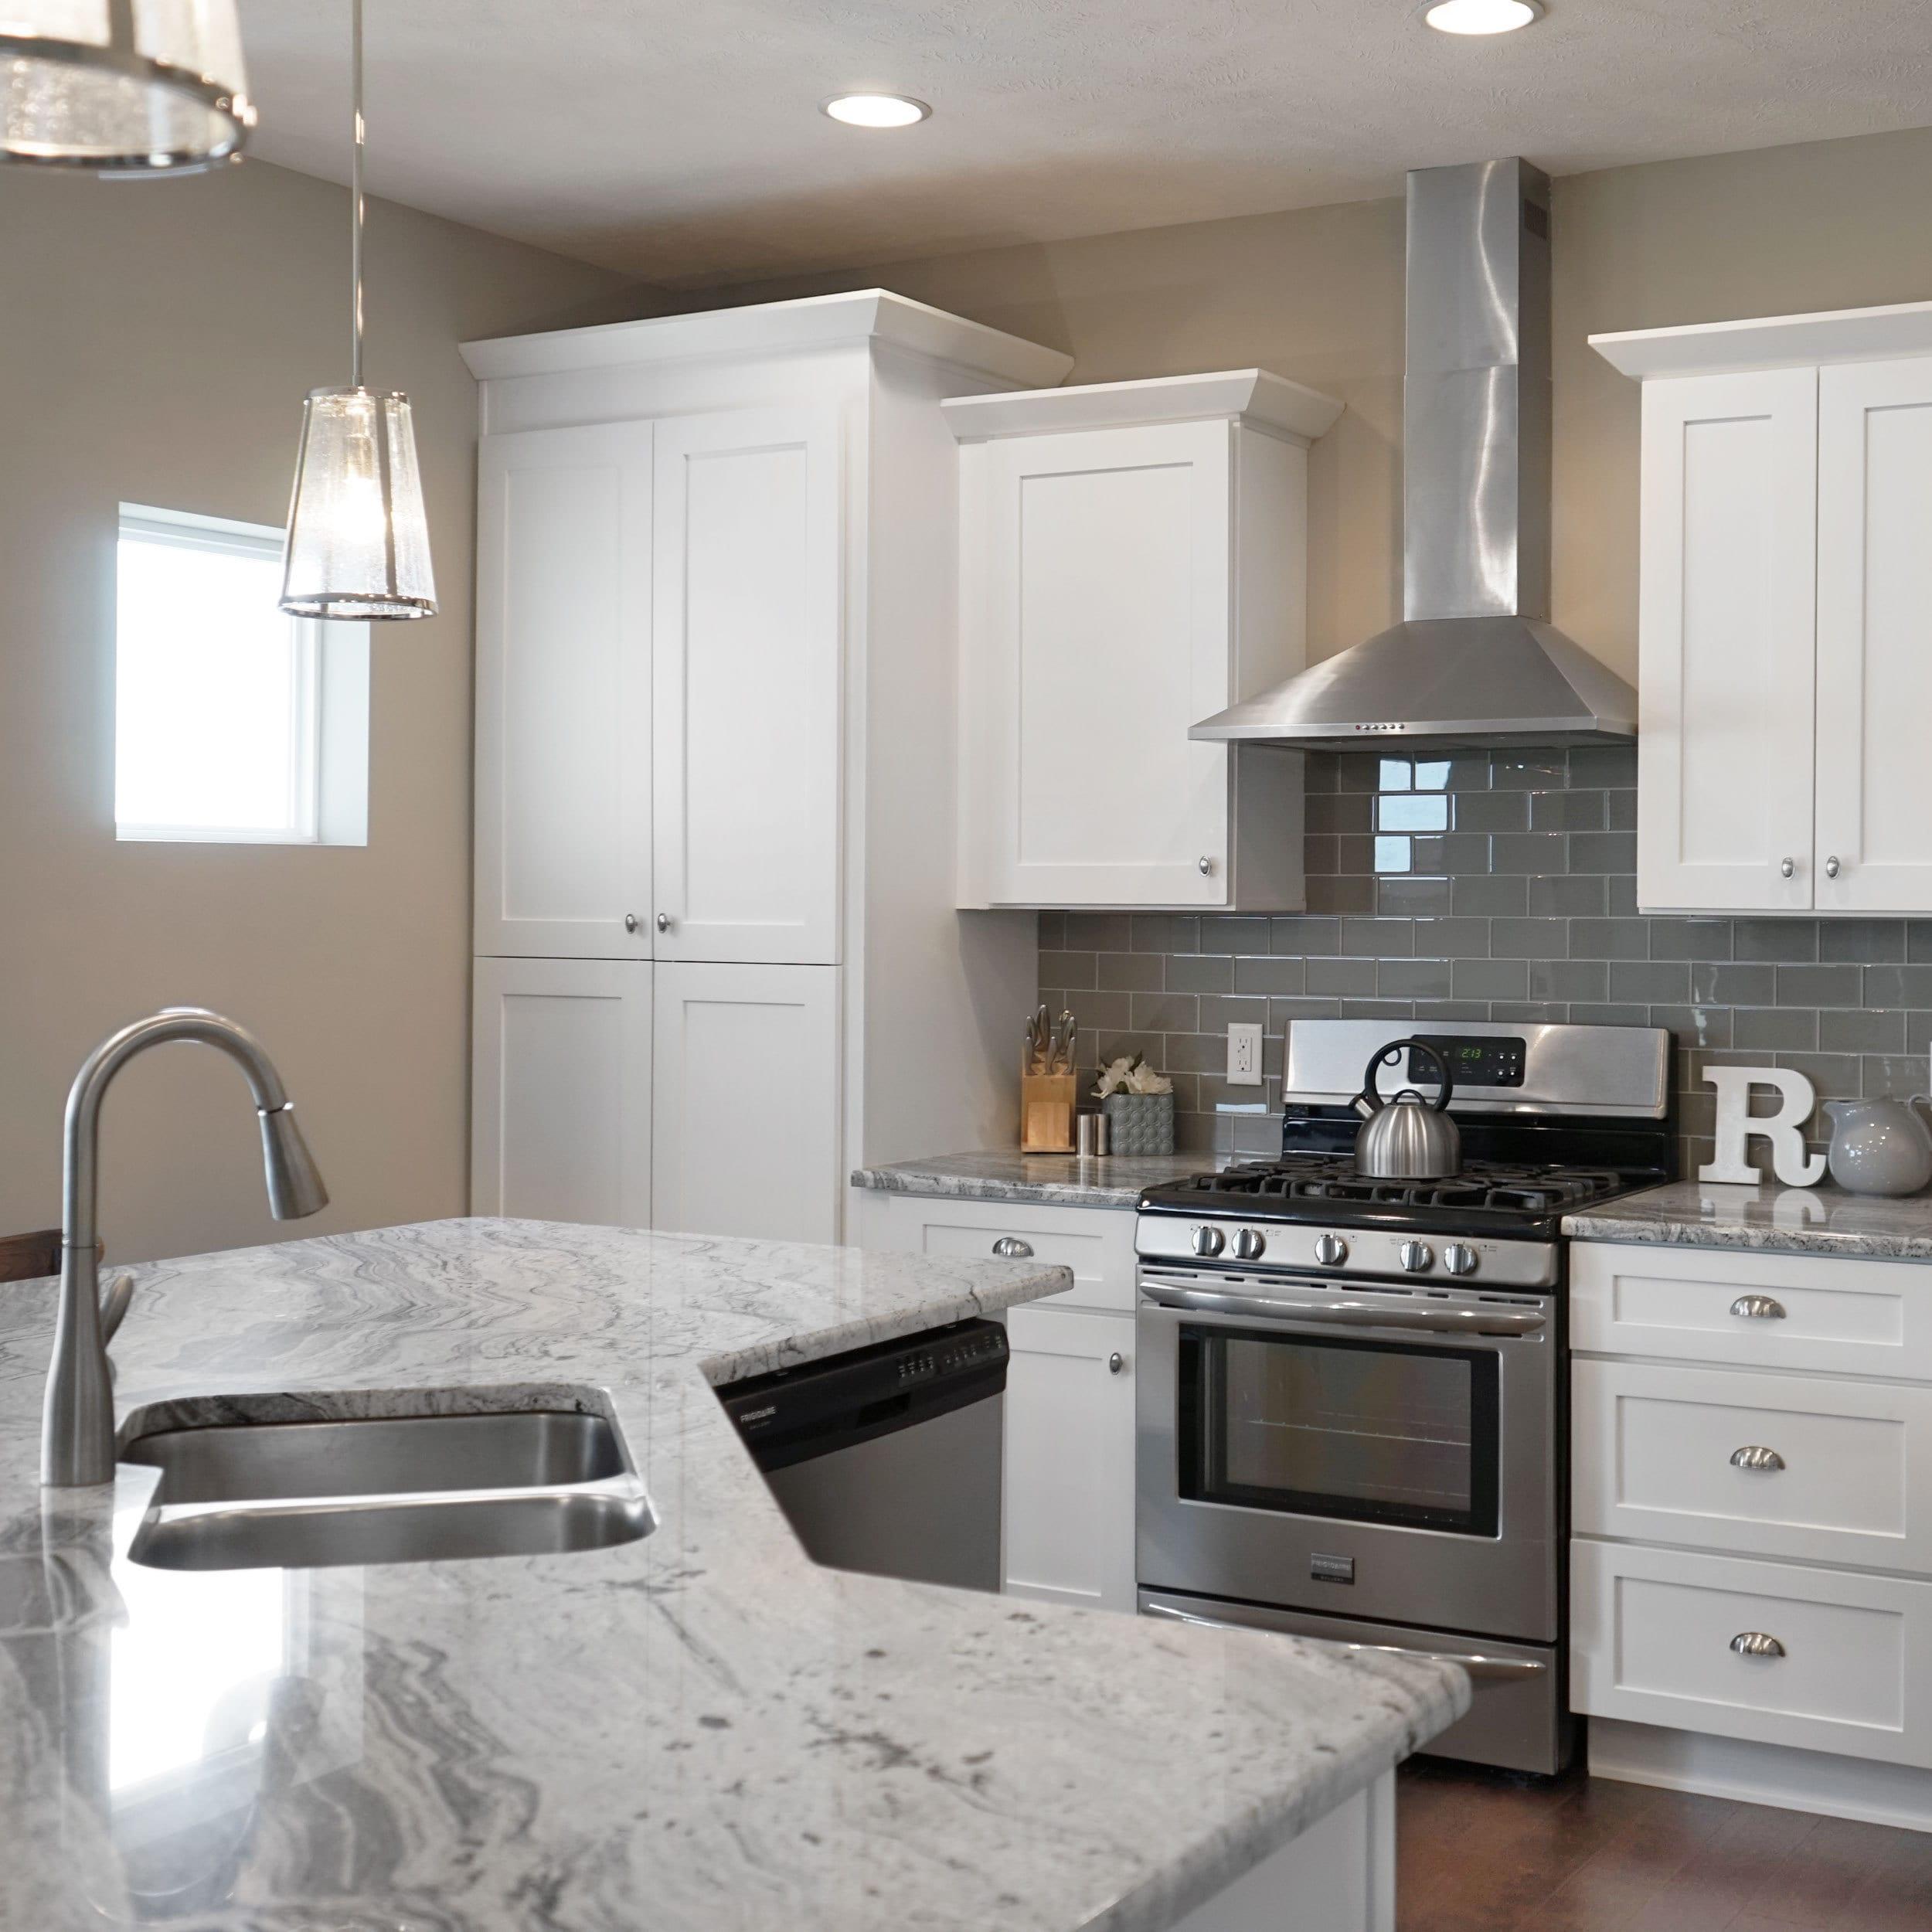 Everyday Cabinets 30 Inch White Shaker Double Door Bridge Wall Kitchen Cabinet